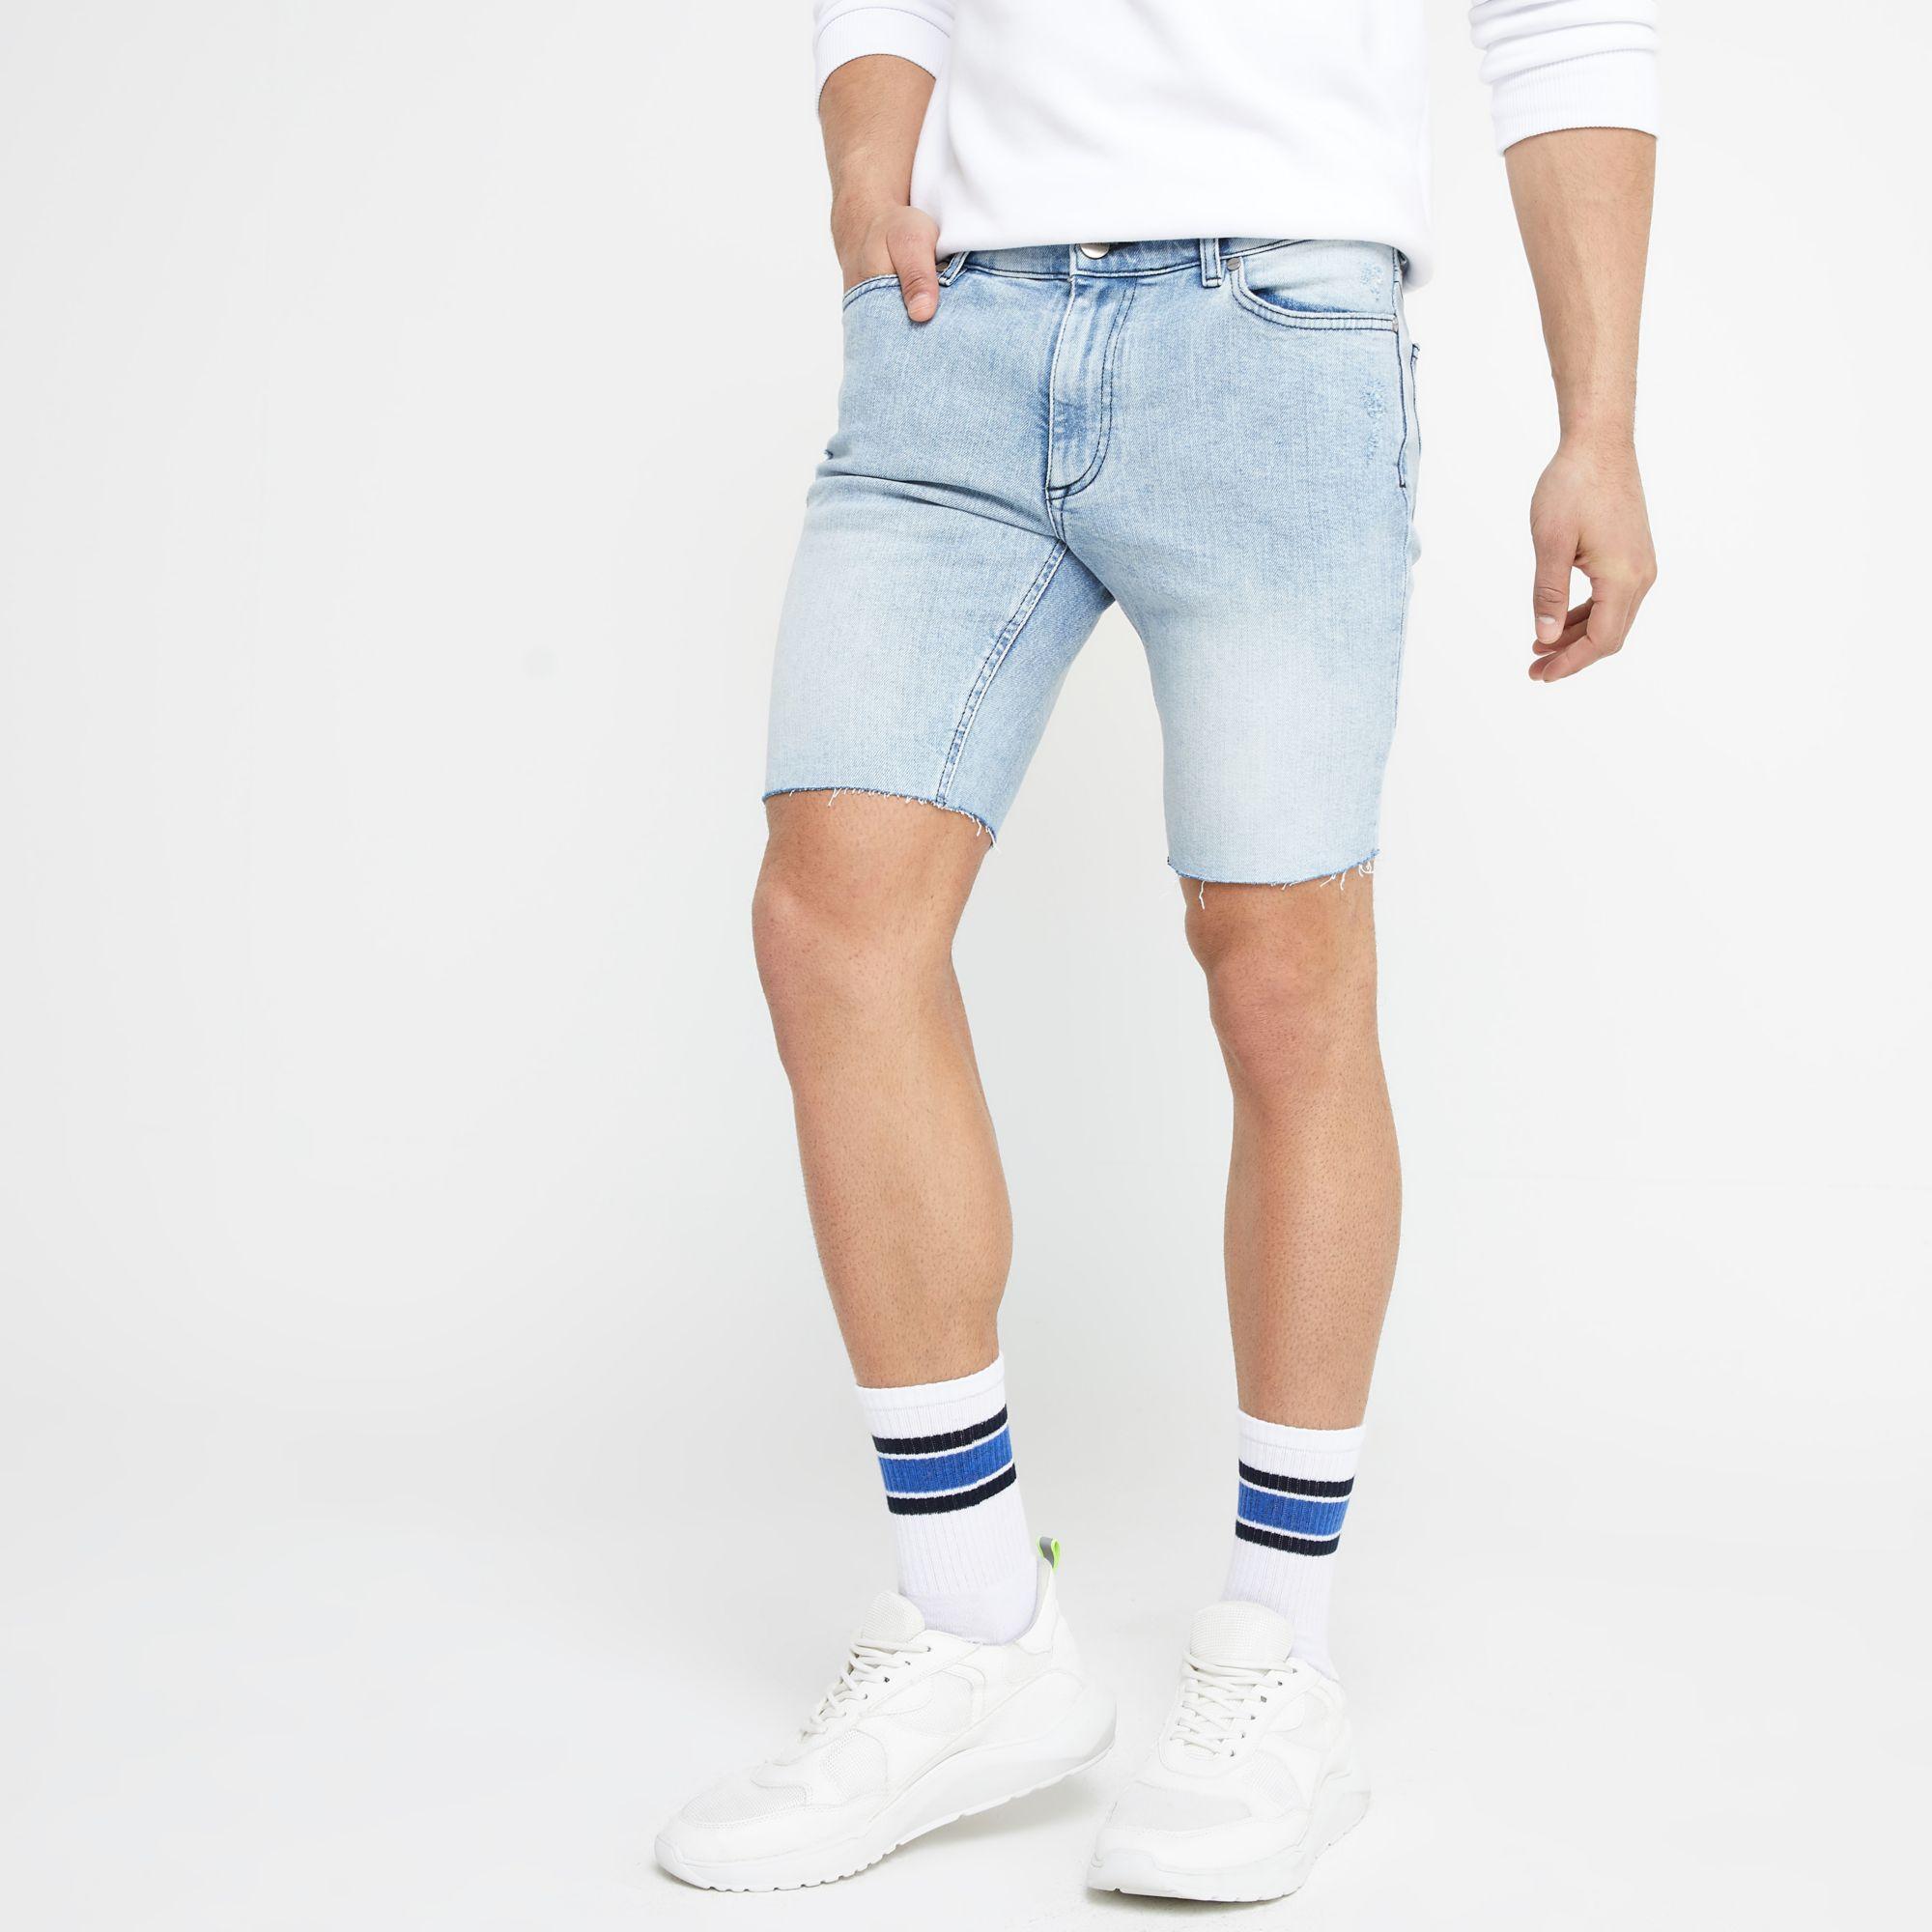 cb5f44e65b ... Blue Light Sid Distressed Skinny Shorts for Men - Lyst. View fullscreen